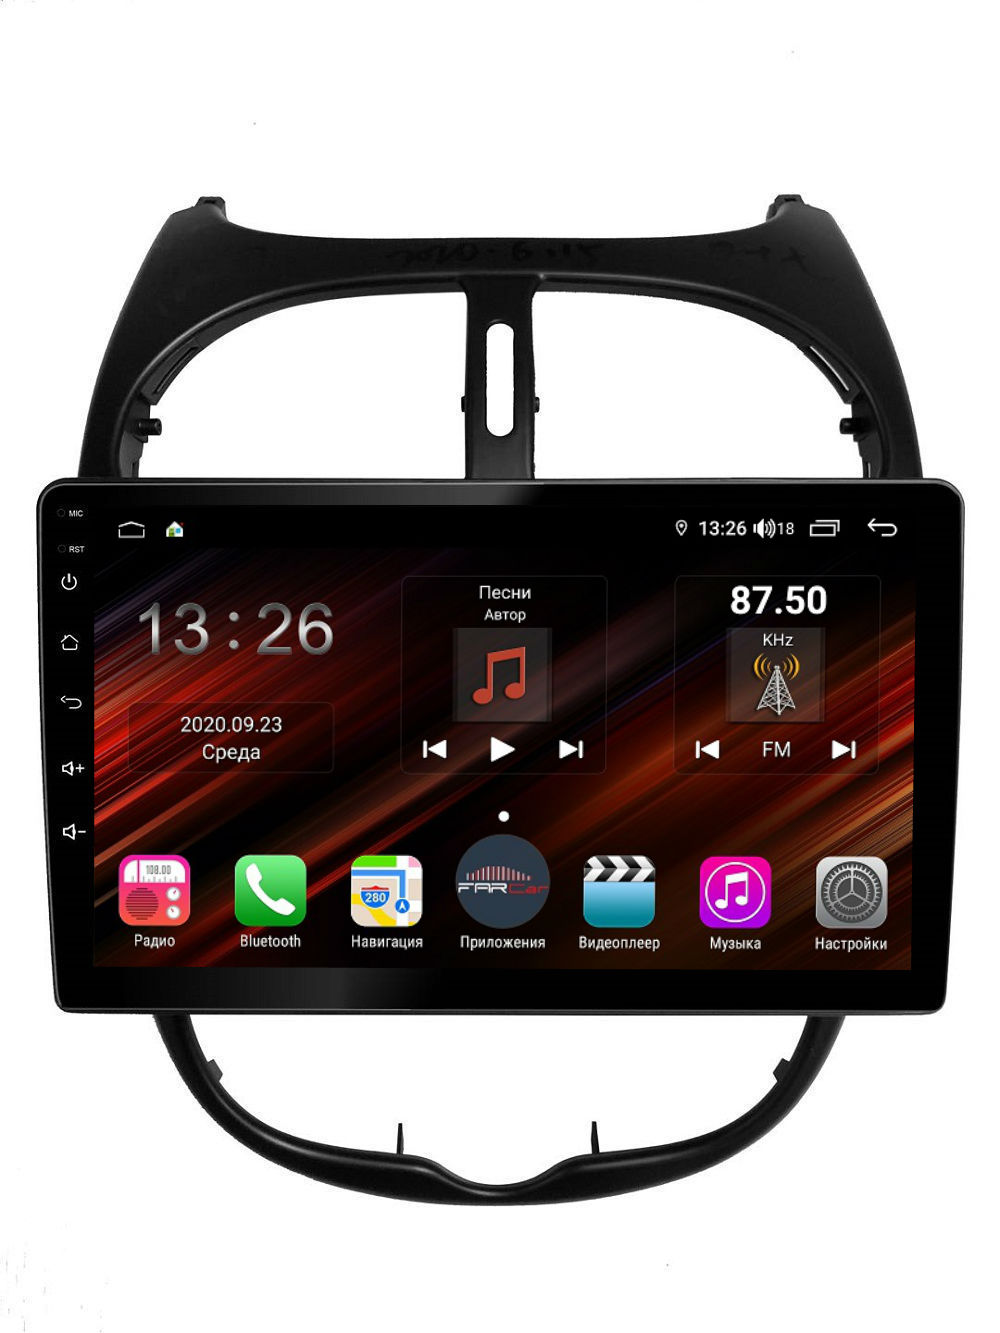 Штатная магнитола FarCar s400 Super HD для Peugeot 206 на Android (XH778R) (+ Камера заднего вида в подарок!)